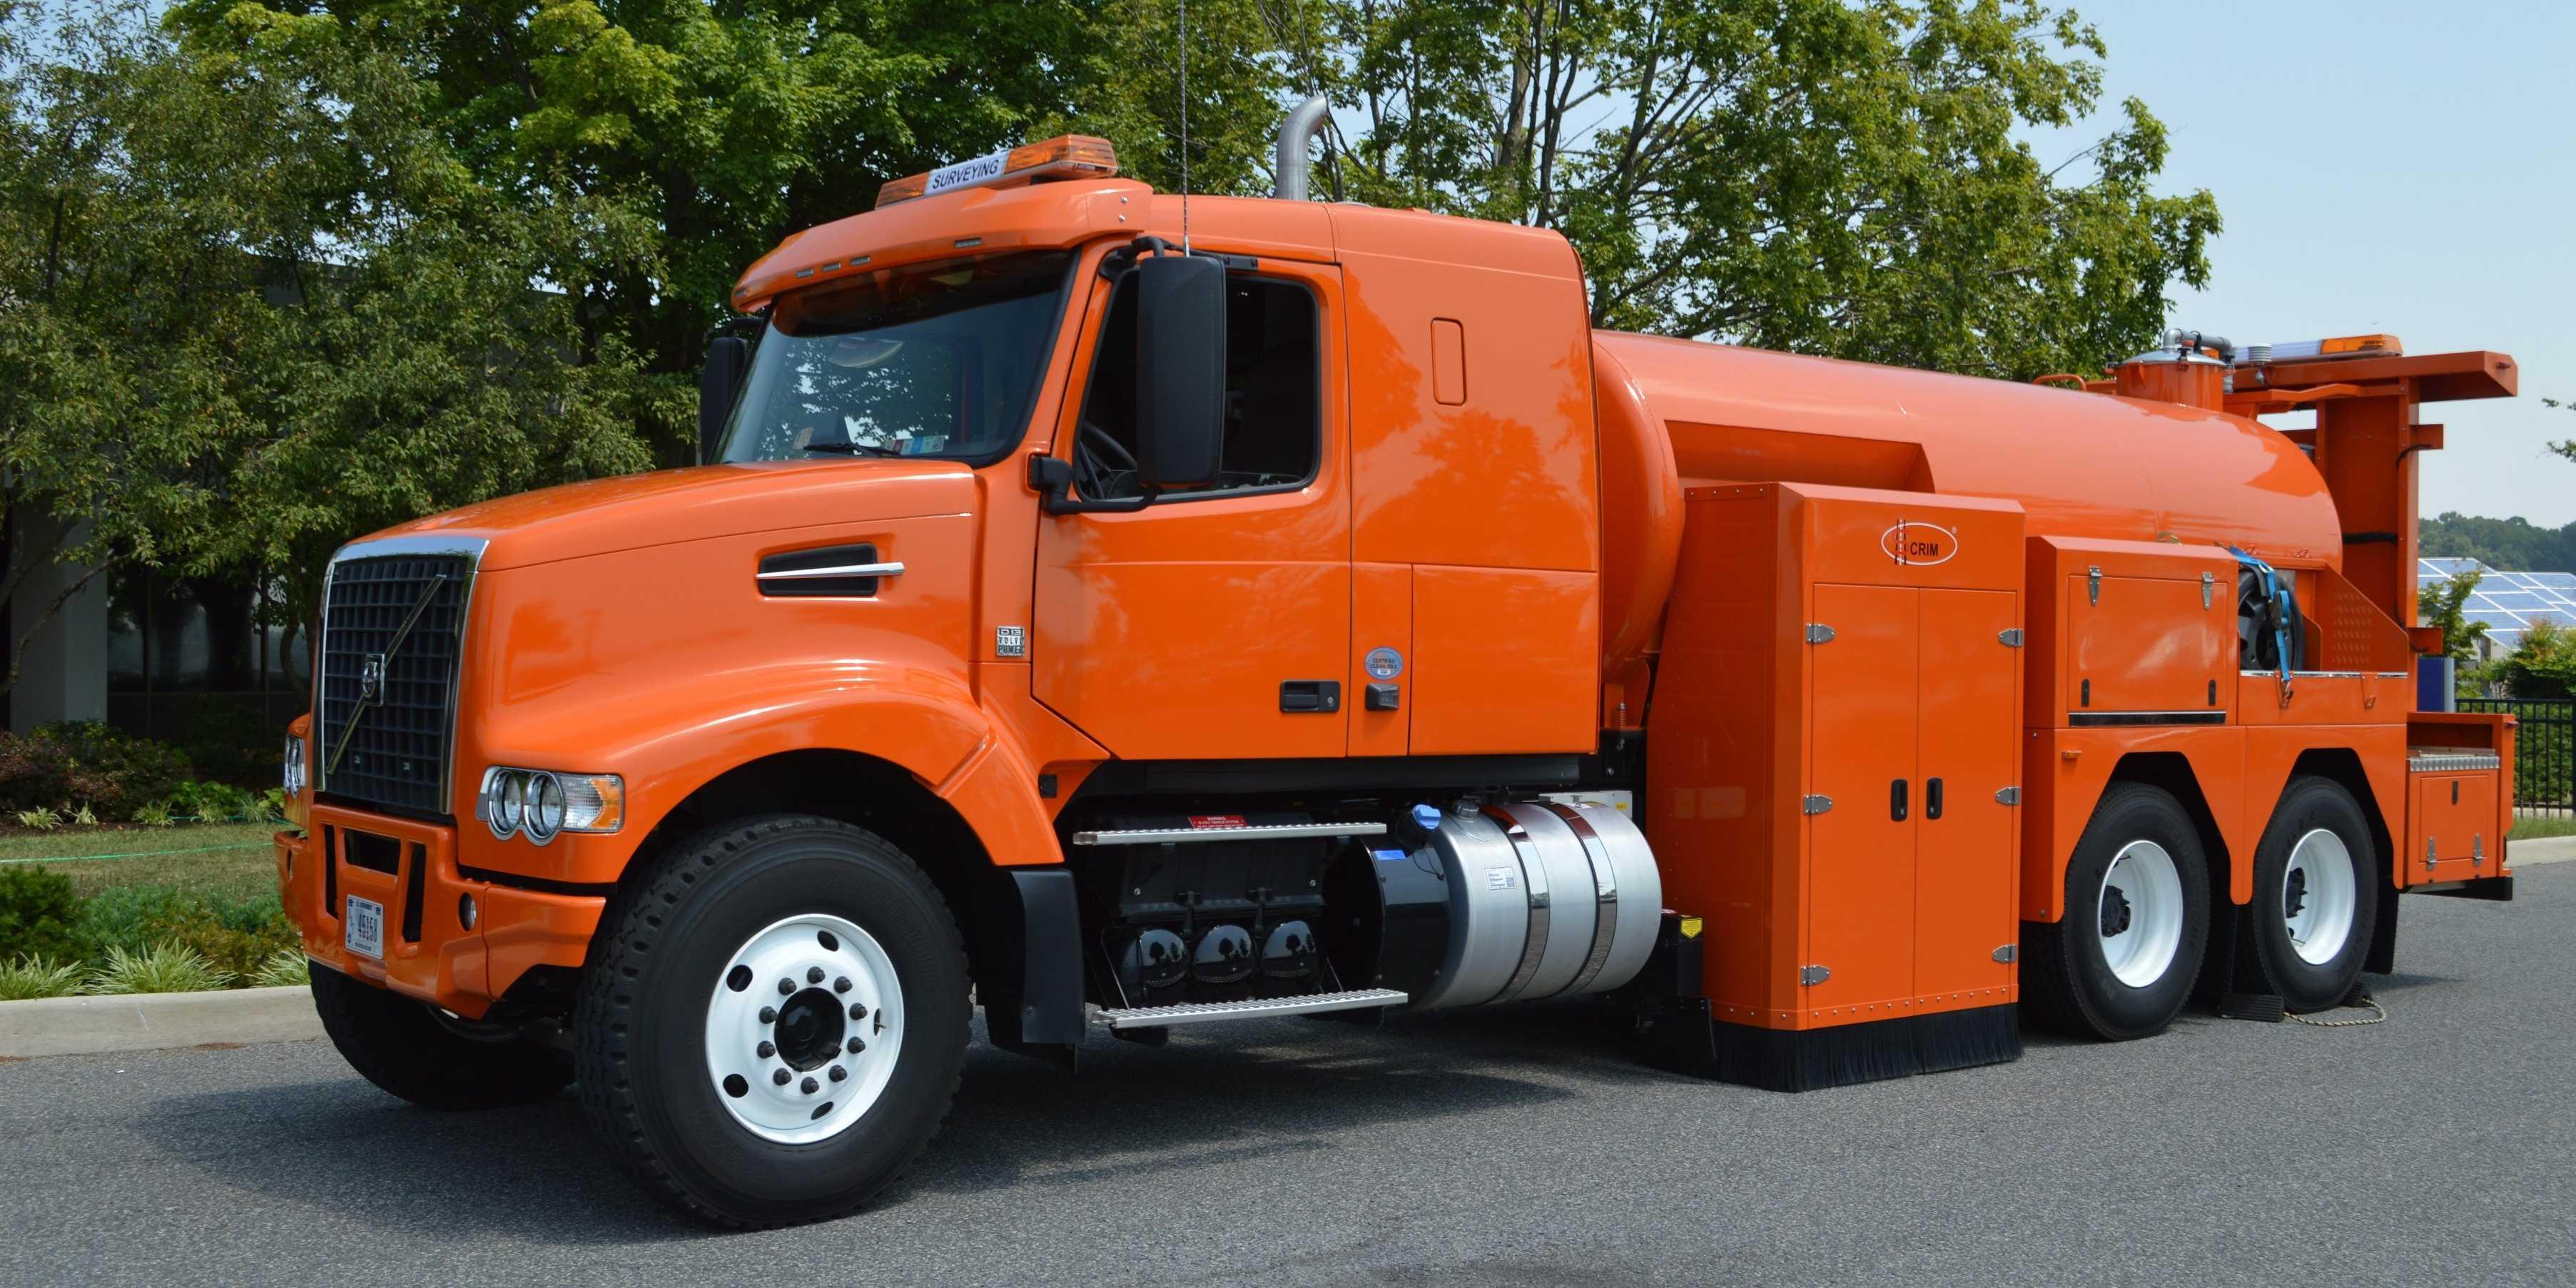 giant orange volvo truck  testing  safety  americas highways